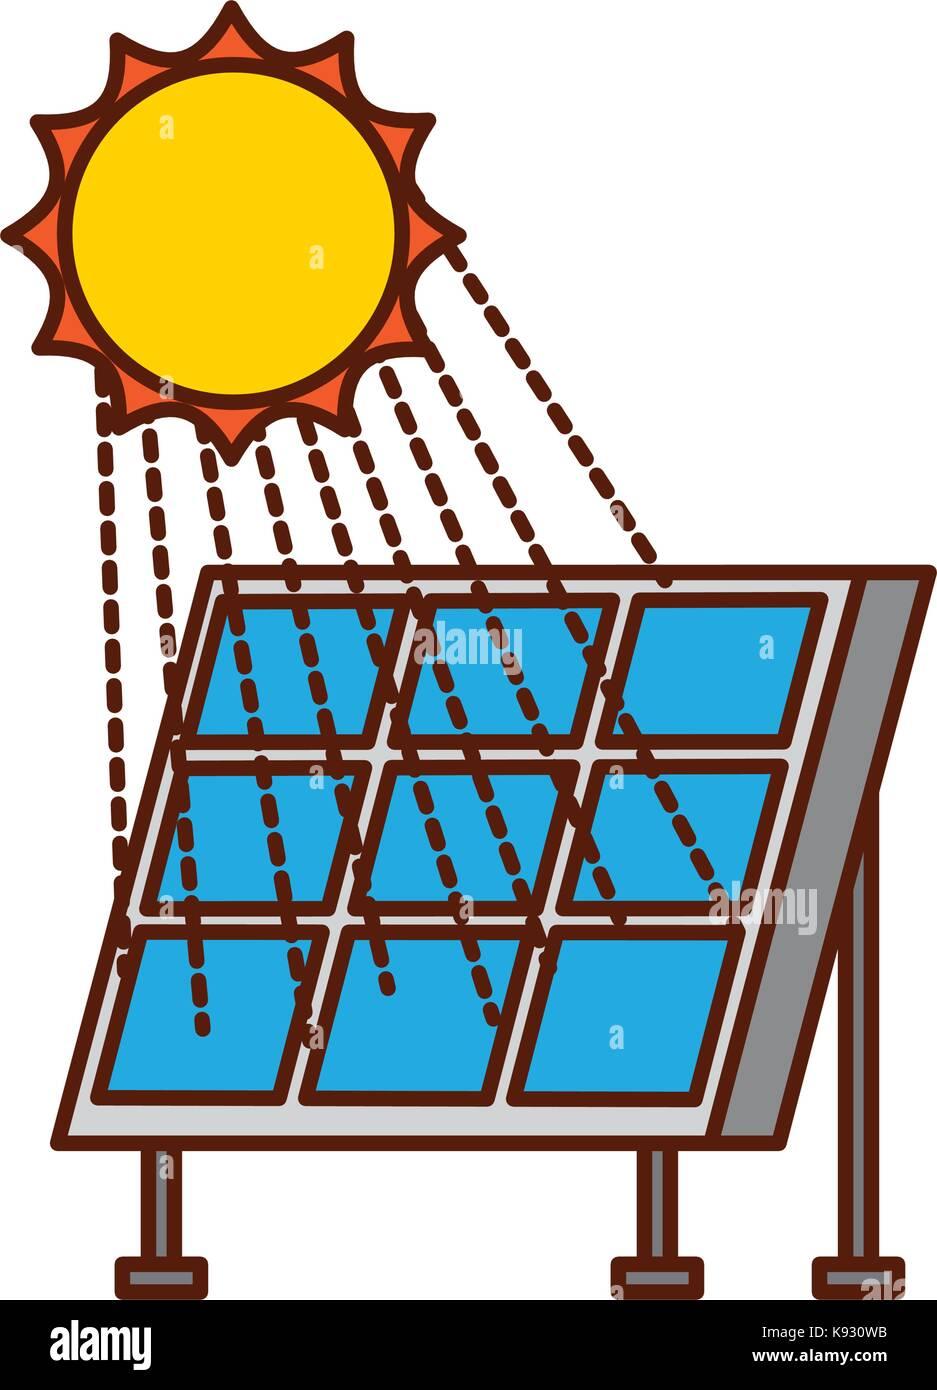 solar panel modern technologies alternative energy sources - Stock Image